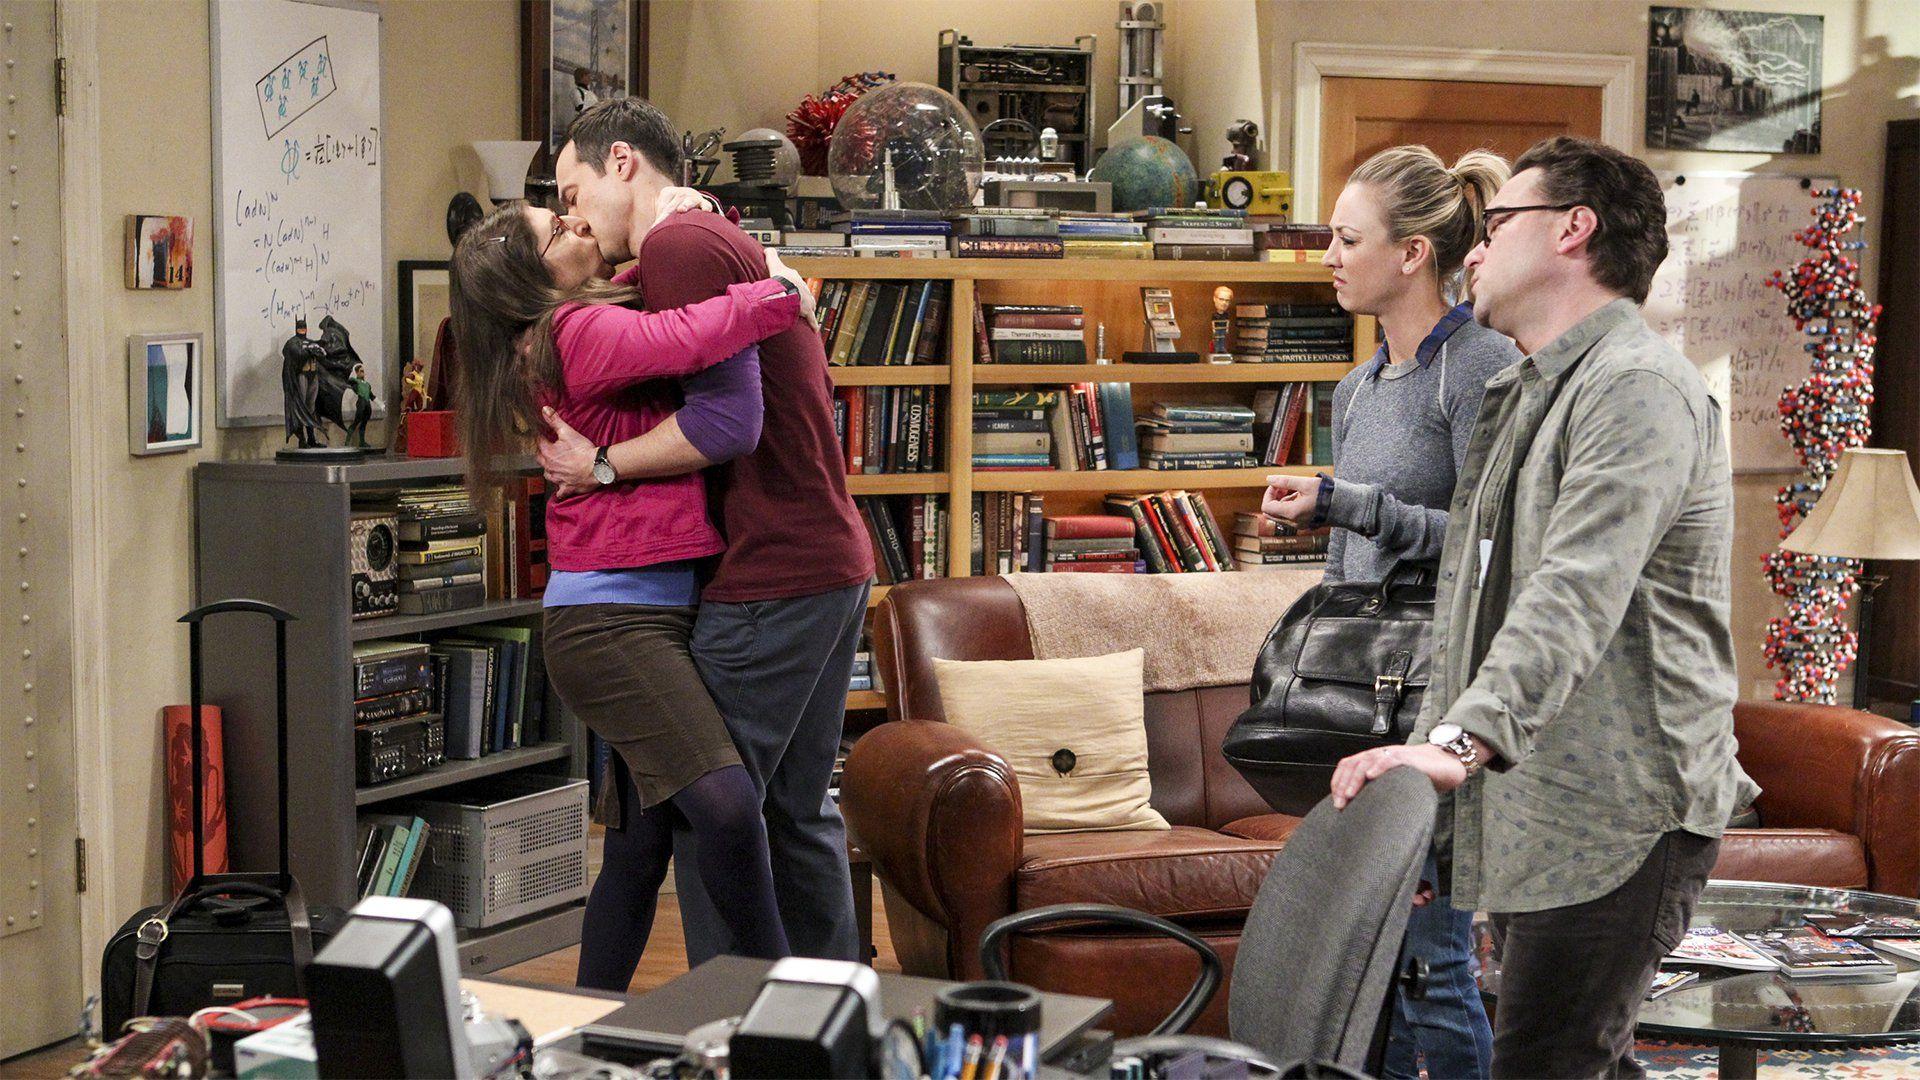 big bang theory season 10 episode 11 free